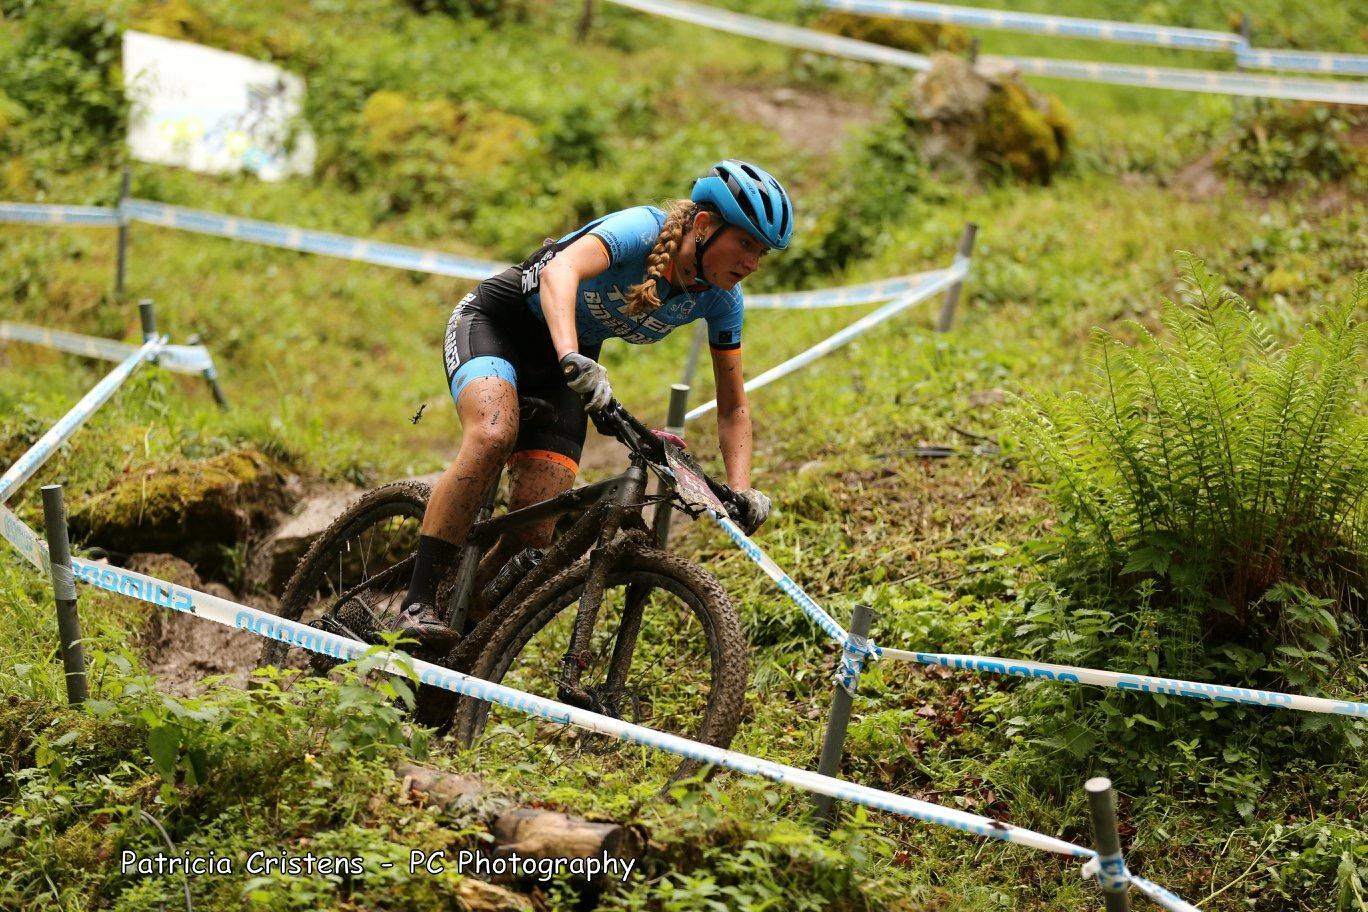 Didi de Vries versterkt komend seizoen het KTM BikeVision team